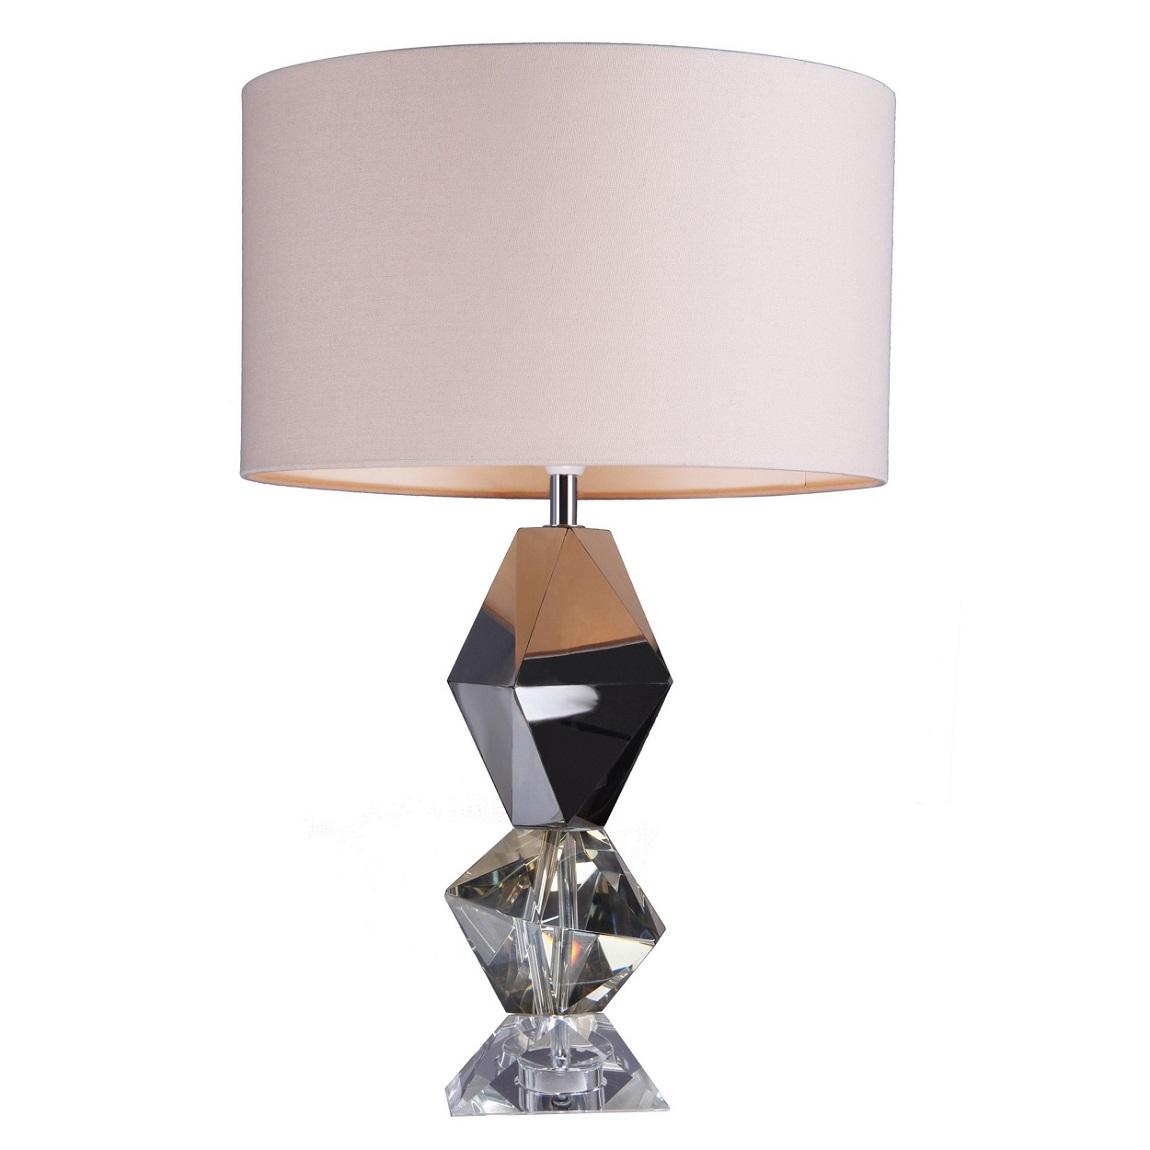 office table lights. Sentinel Debenhams Home Collection \u0027Bailey\u0027 Table Lamp Contemporary Office Desk Light Lights 3